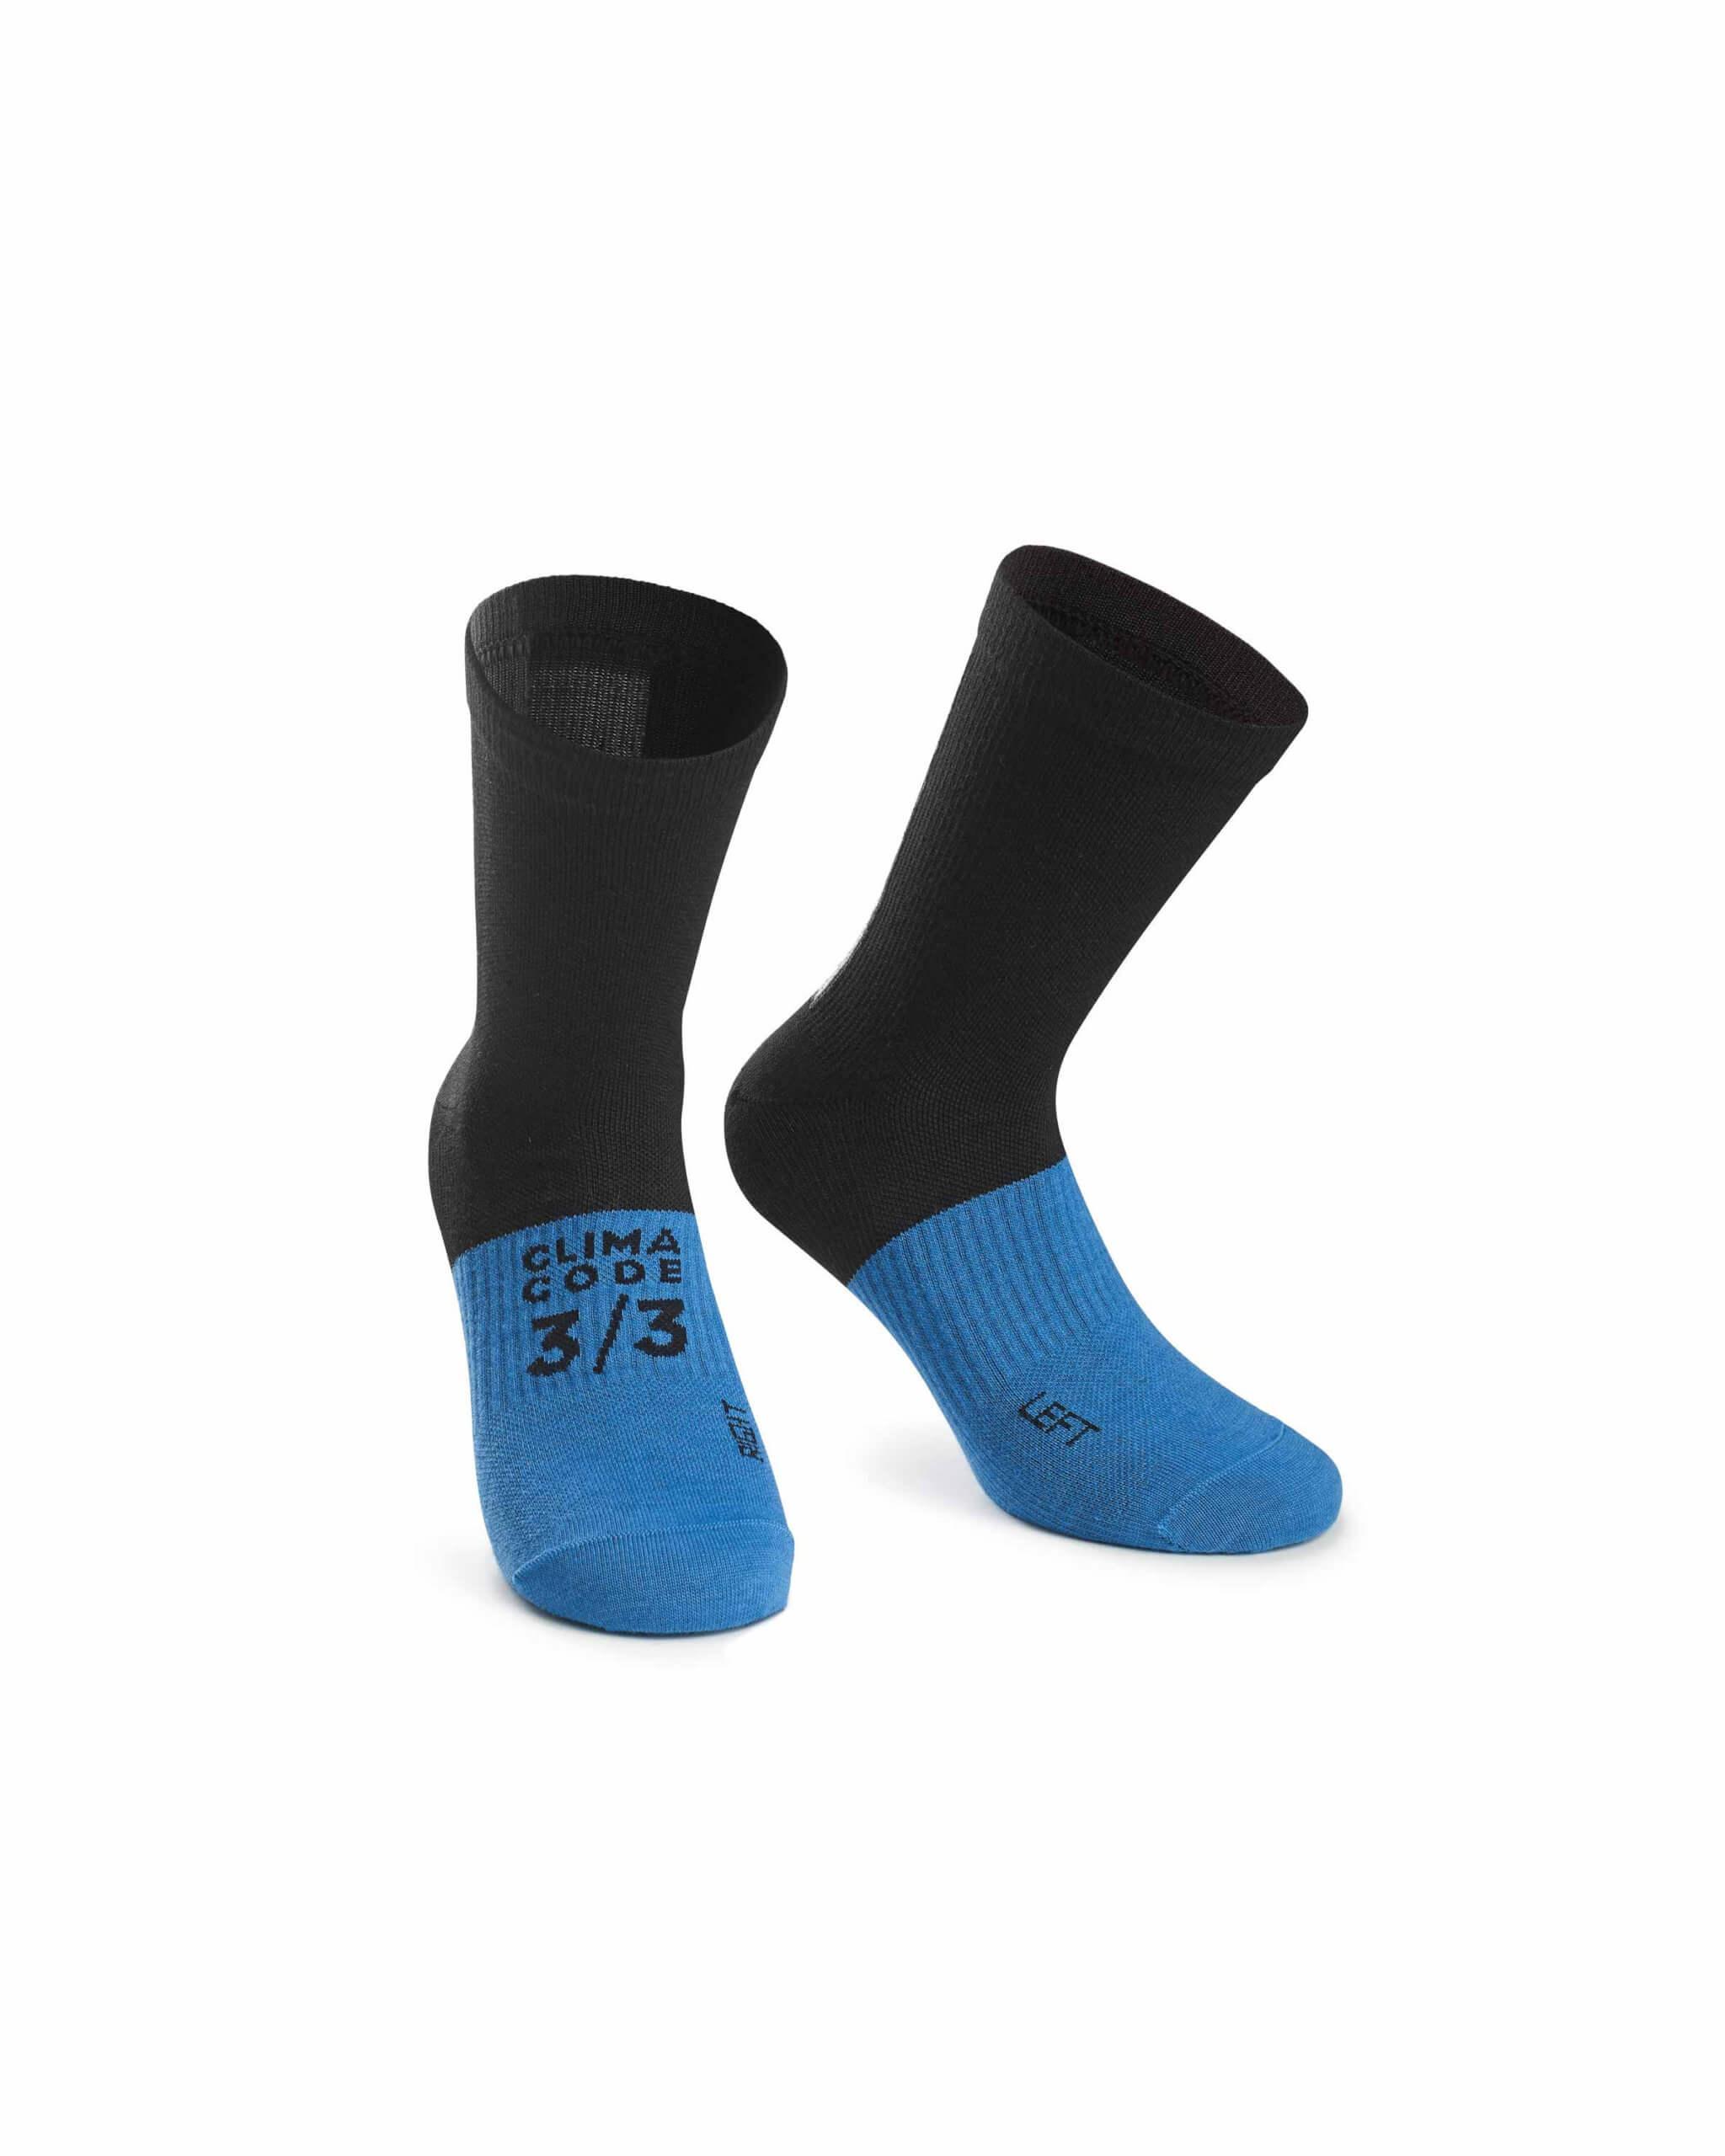 Skarpety zimowe Assos utraz winter socks